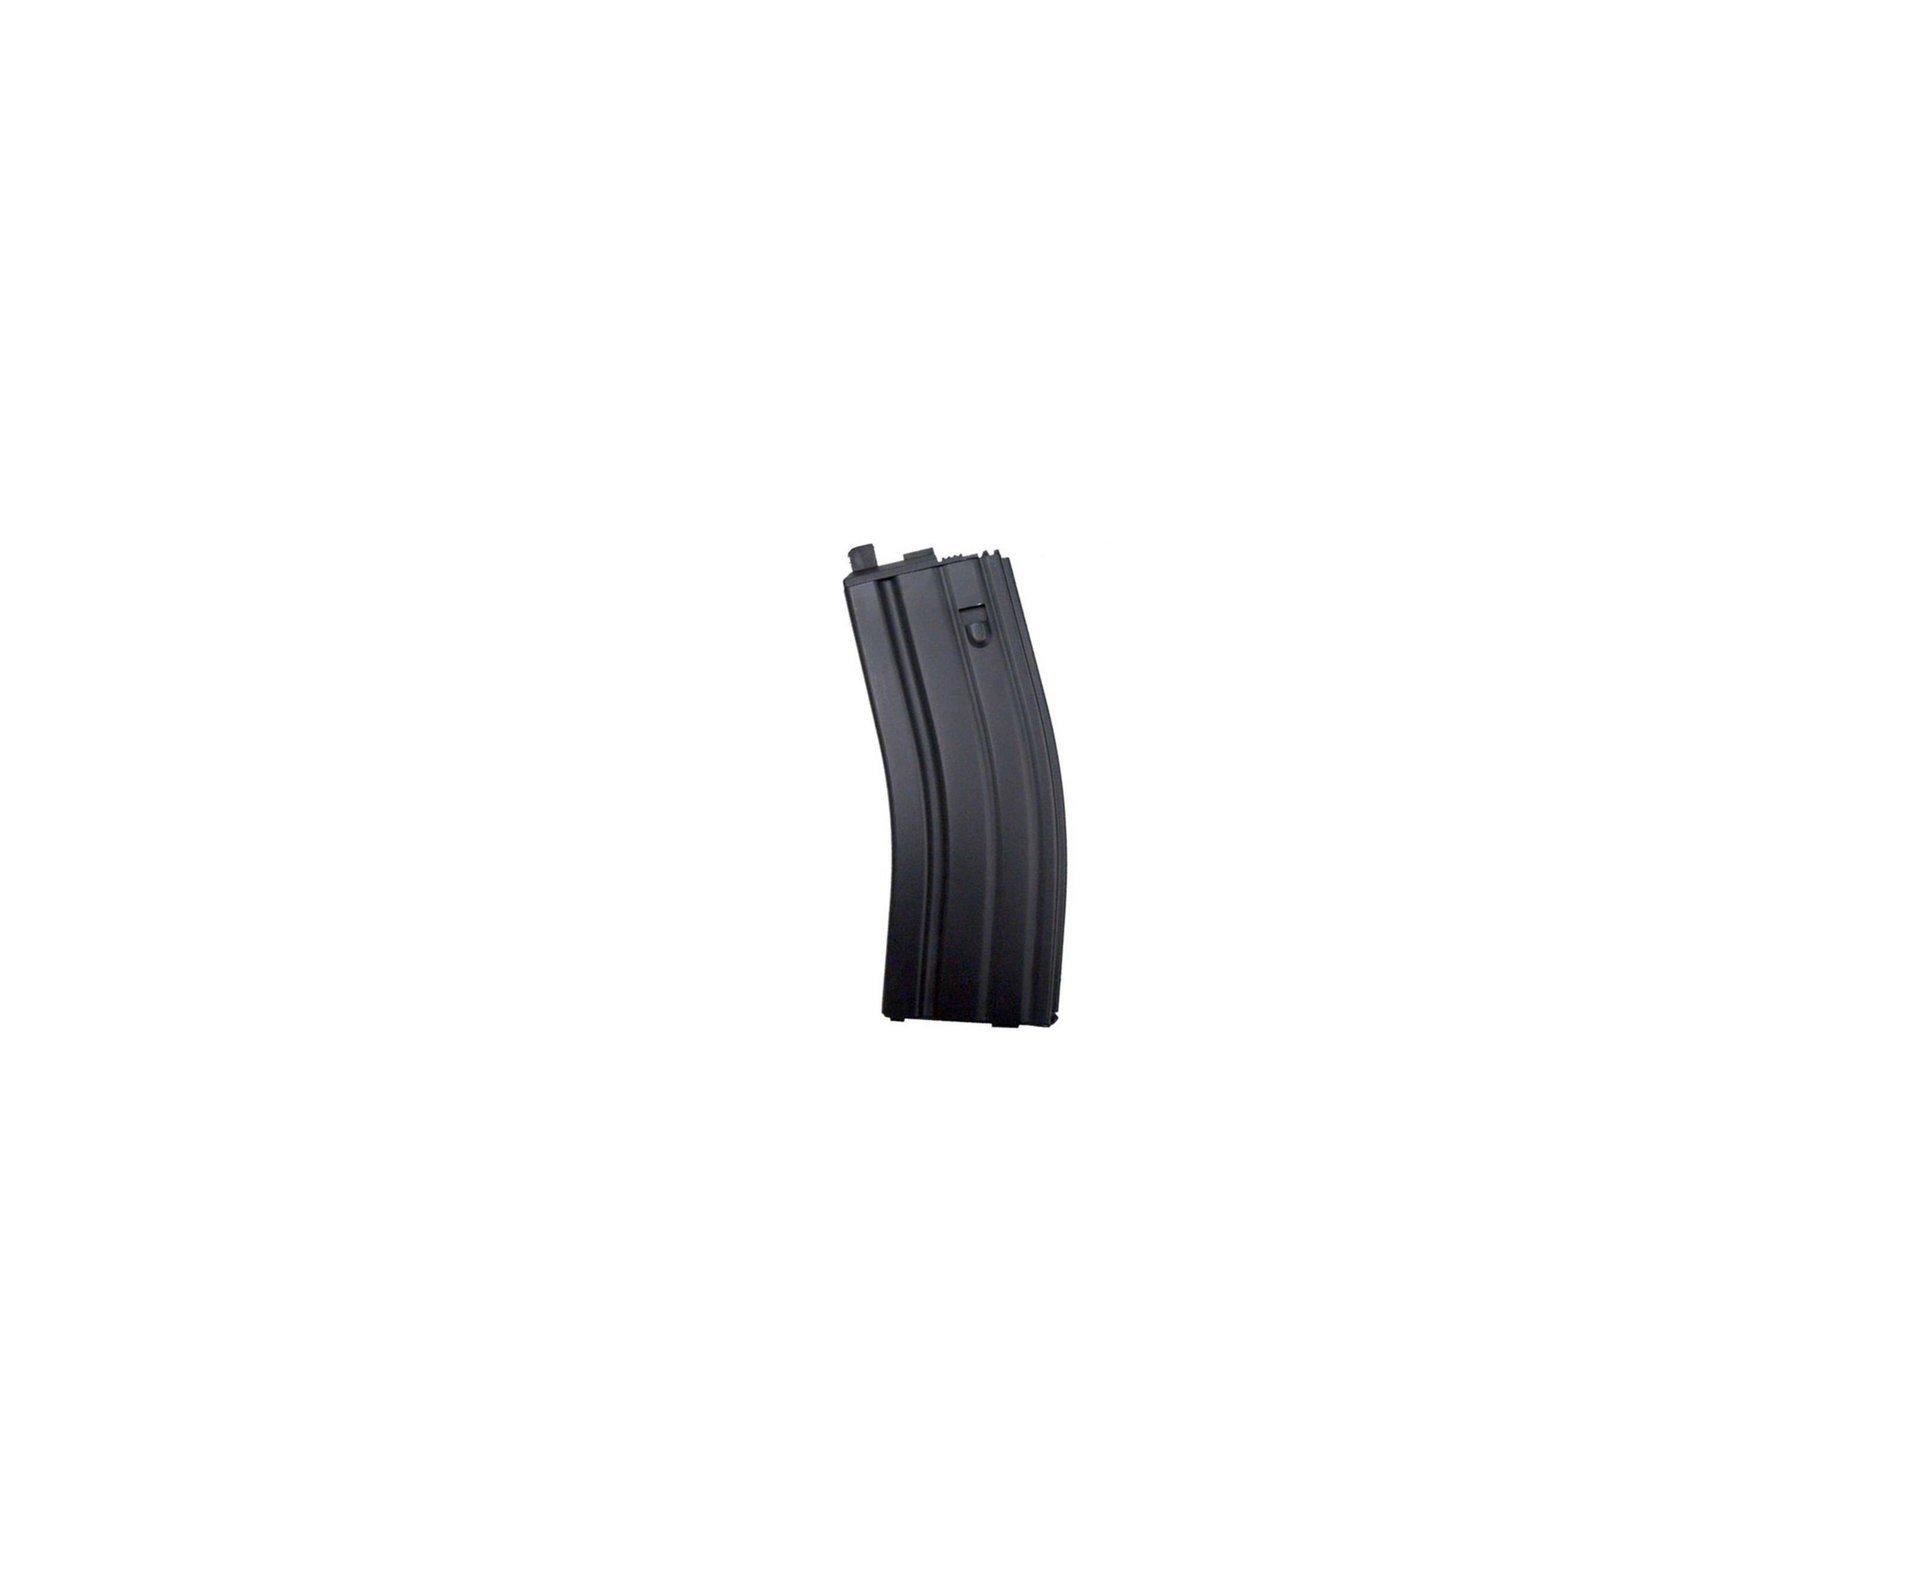 Magazine Para Airsoft Colt M4 - Esfera Plástica 6,0 Mm